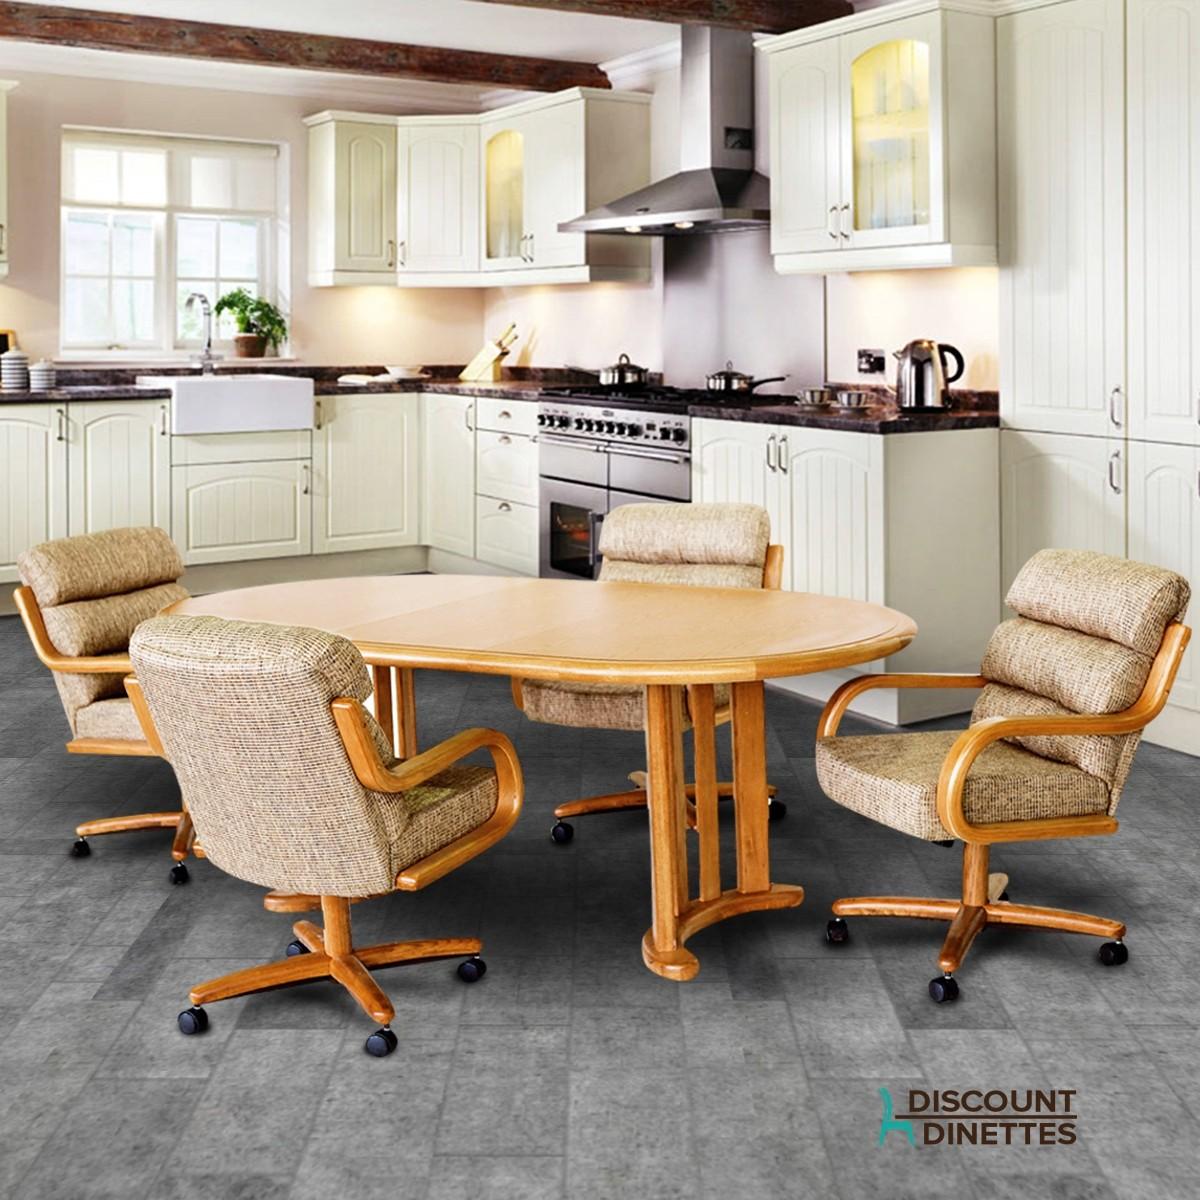 Chromcraft Furniture T141-456 And C137-936 Dinette Set